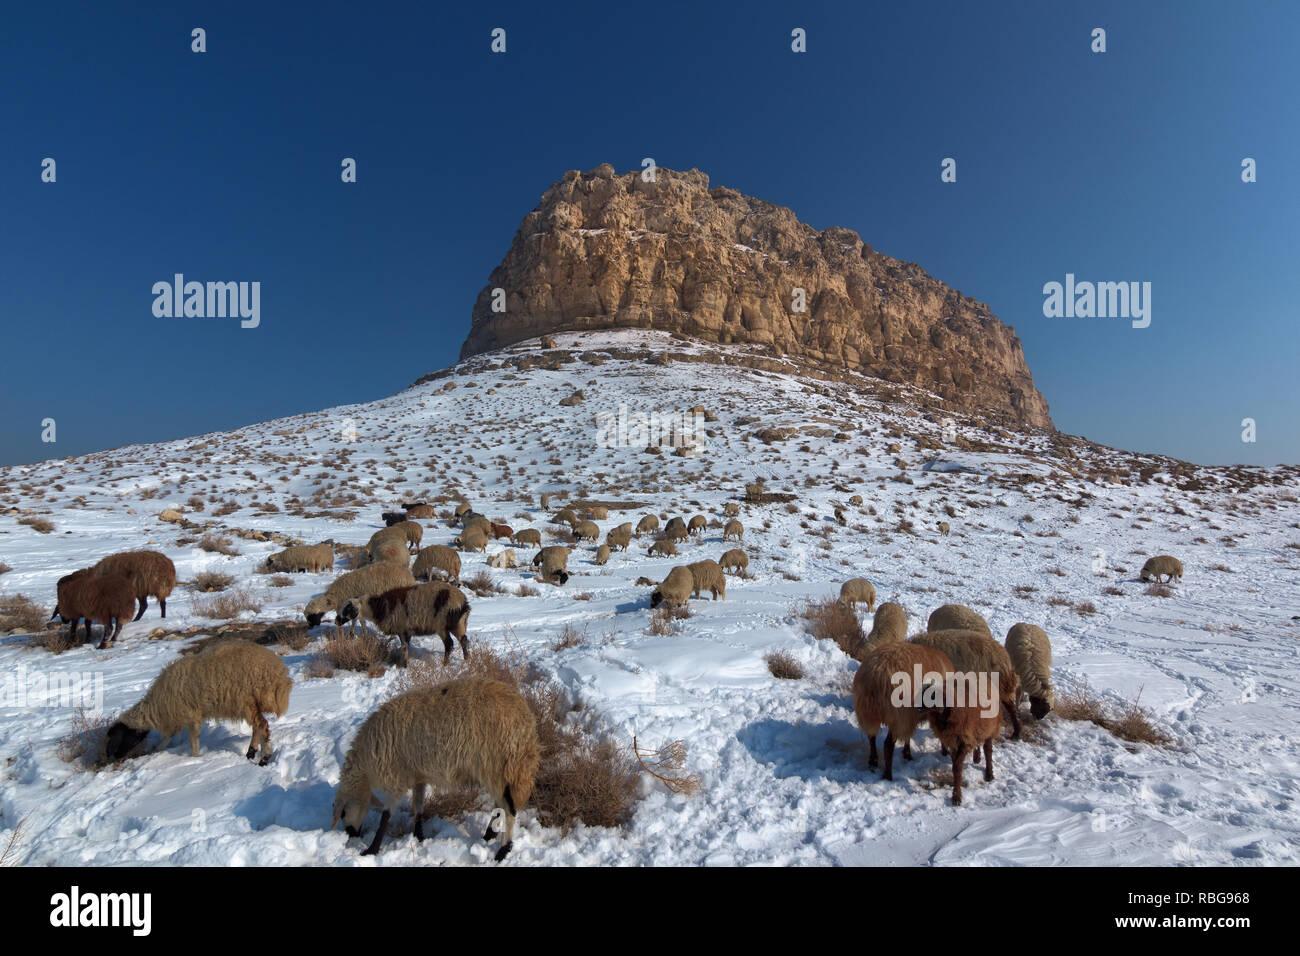 The sheep flocks on the hill of Kazim Dashi, Placed in Urmia Lake, West Azerbaijan province, Iran - Stock Image